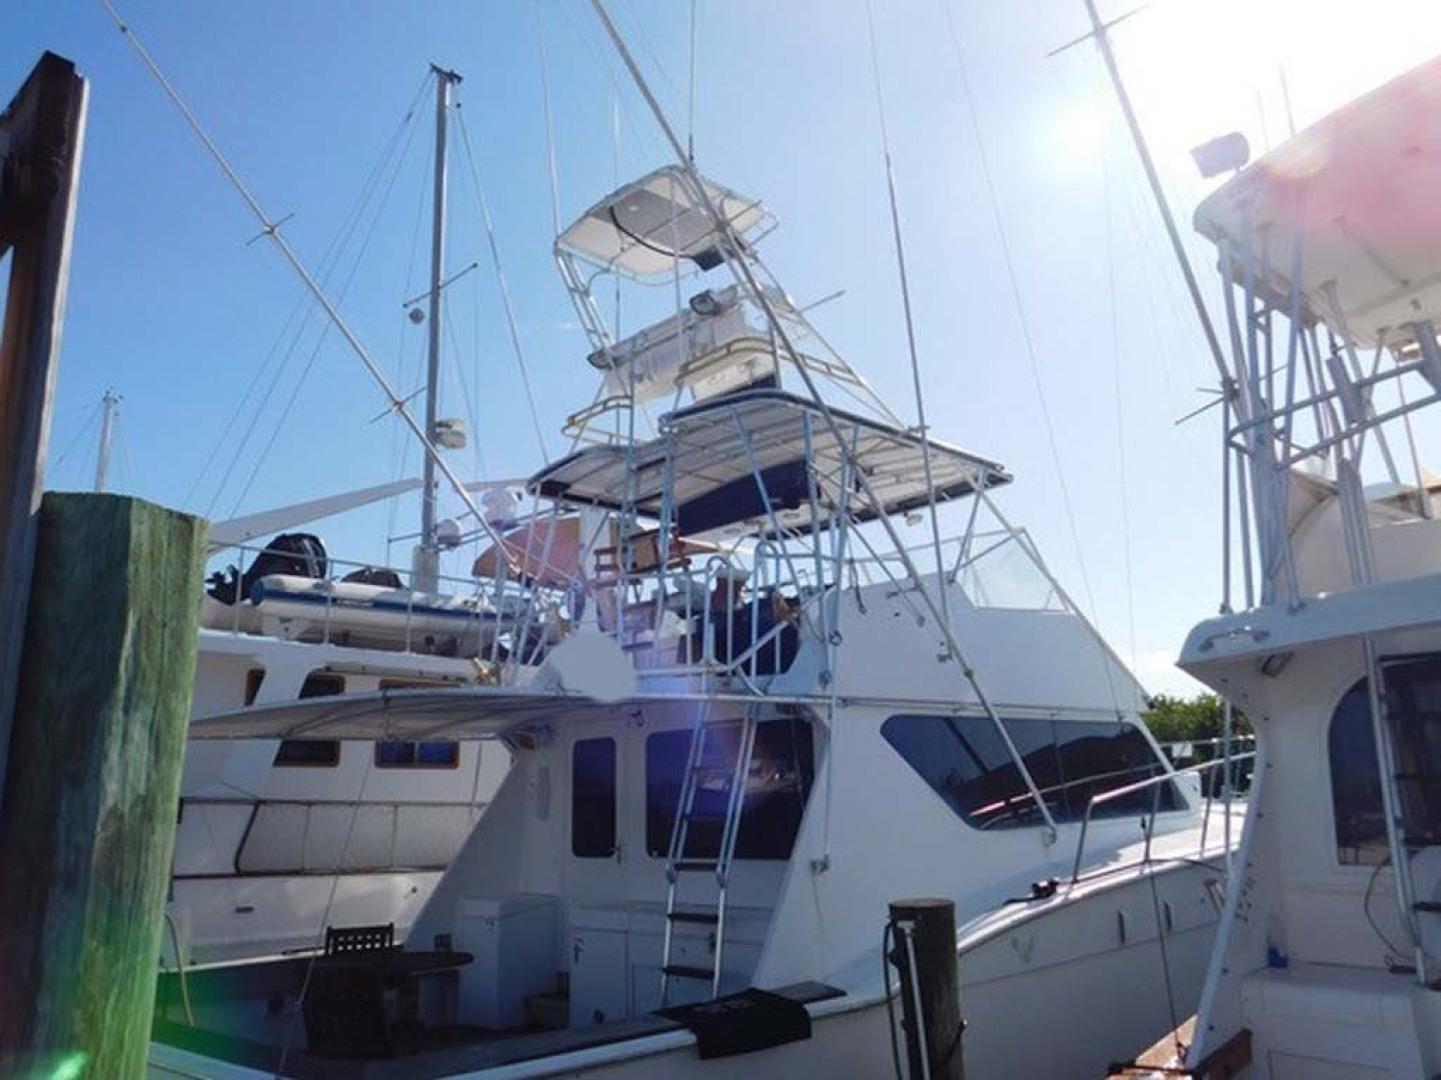 Hatteras-Convertible 1986-My Alyby Merritt Island-Florida-United States-Main Profile-1410930 | Thumbnail